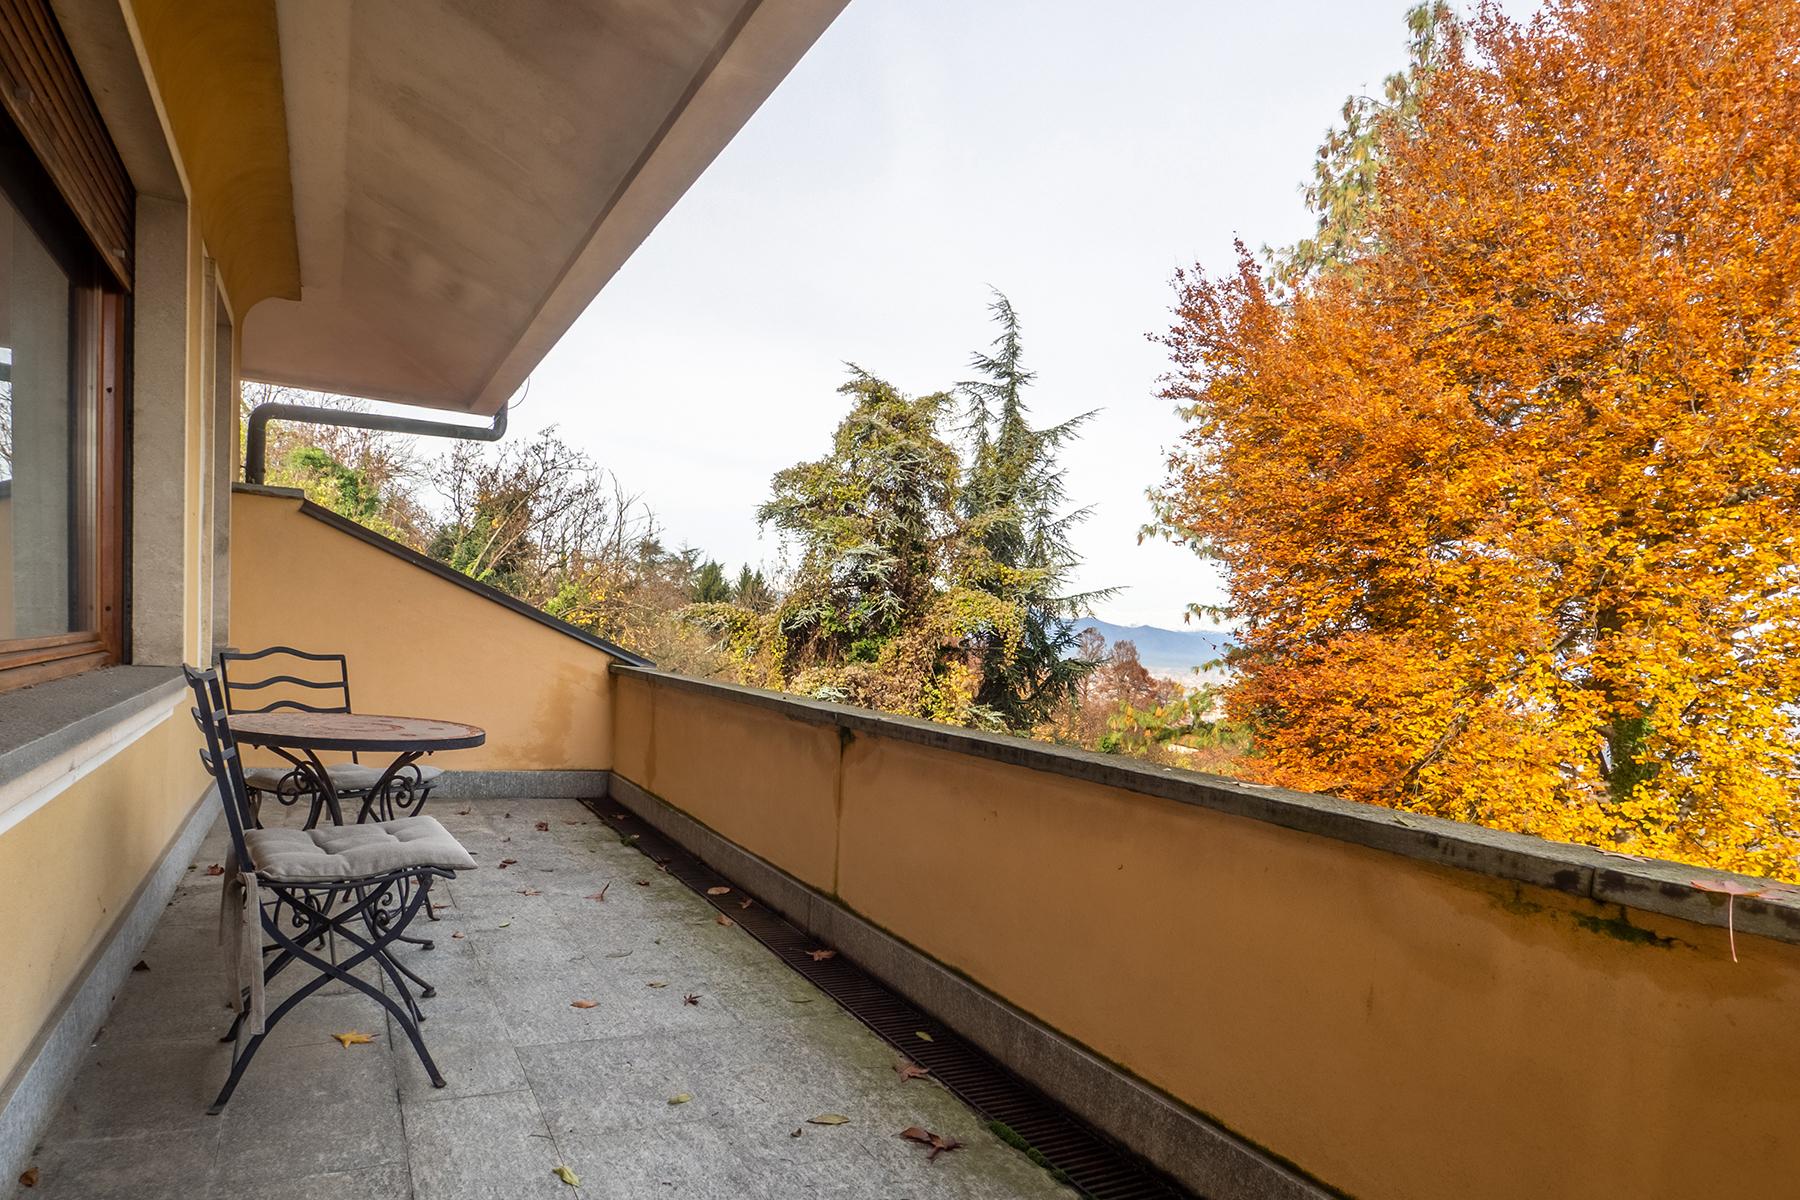 Casa indipendente in Vendita a Torino: 5 locali, 277 mq - Foto 7